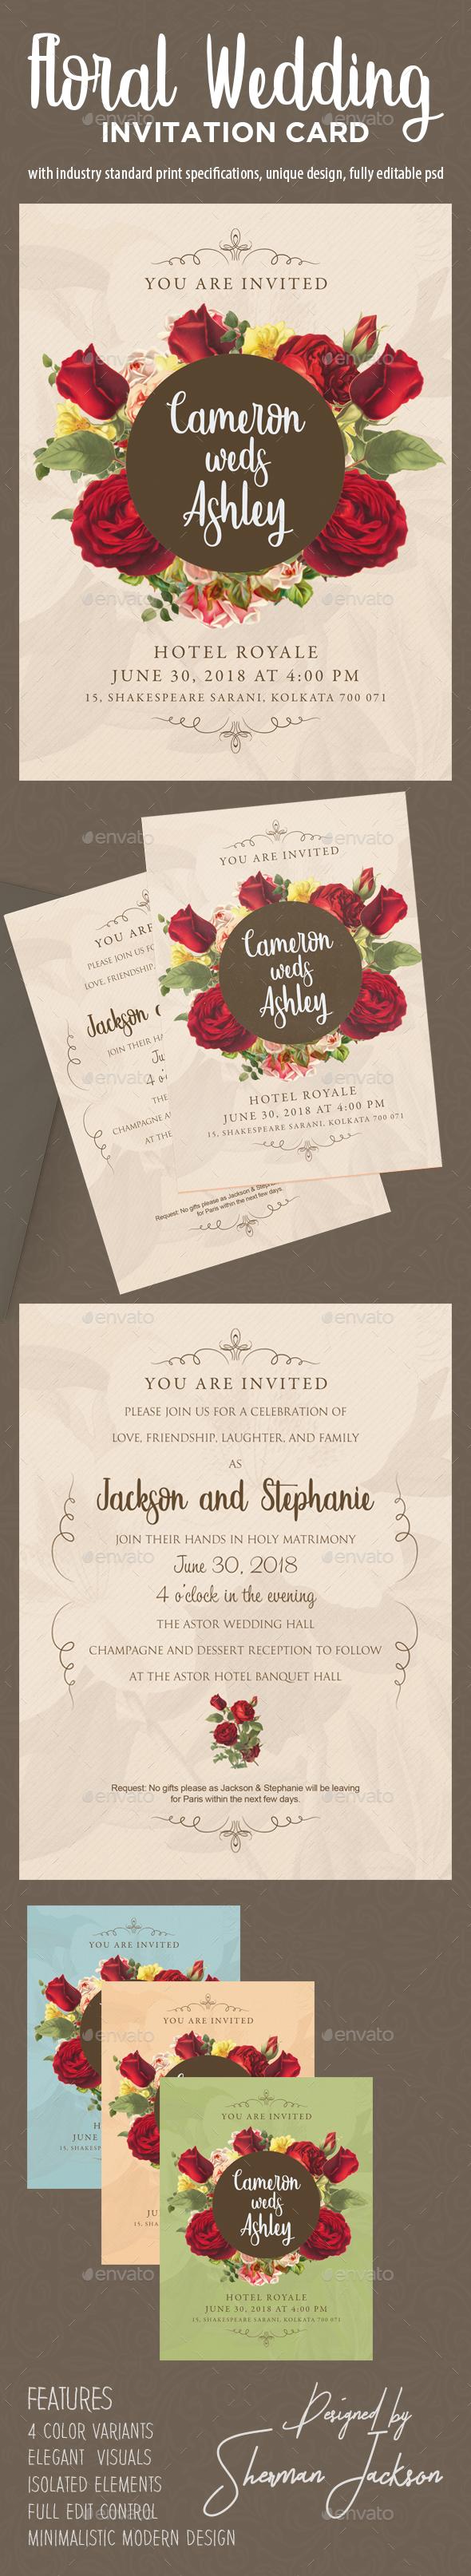 Floral wedding invitation card by widerpurpose graphicriver floral wedding invitation card wedding greeting cards stopboris Choice Image